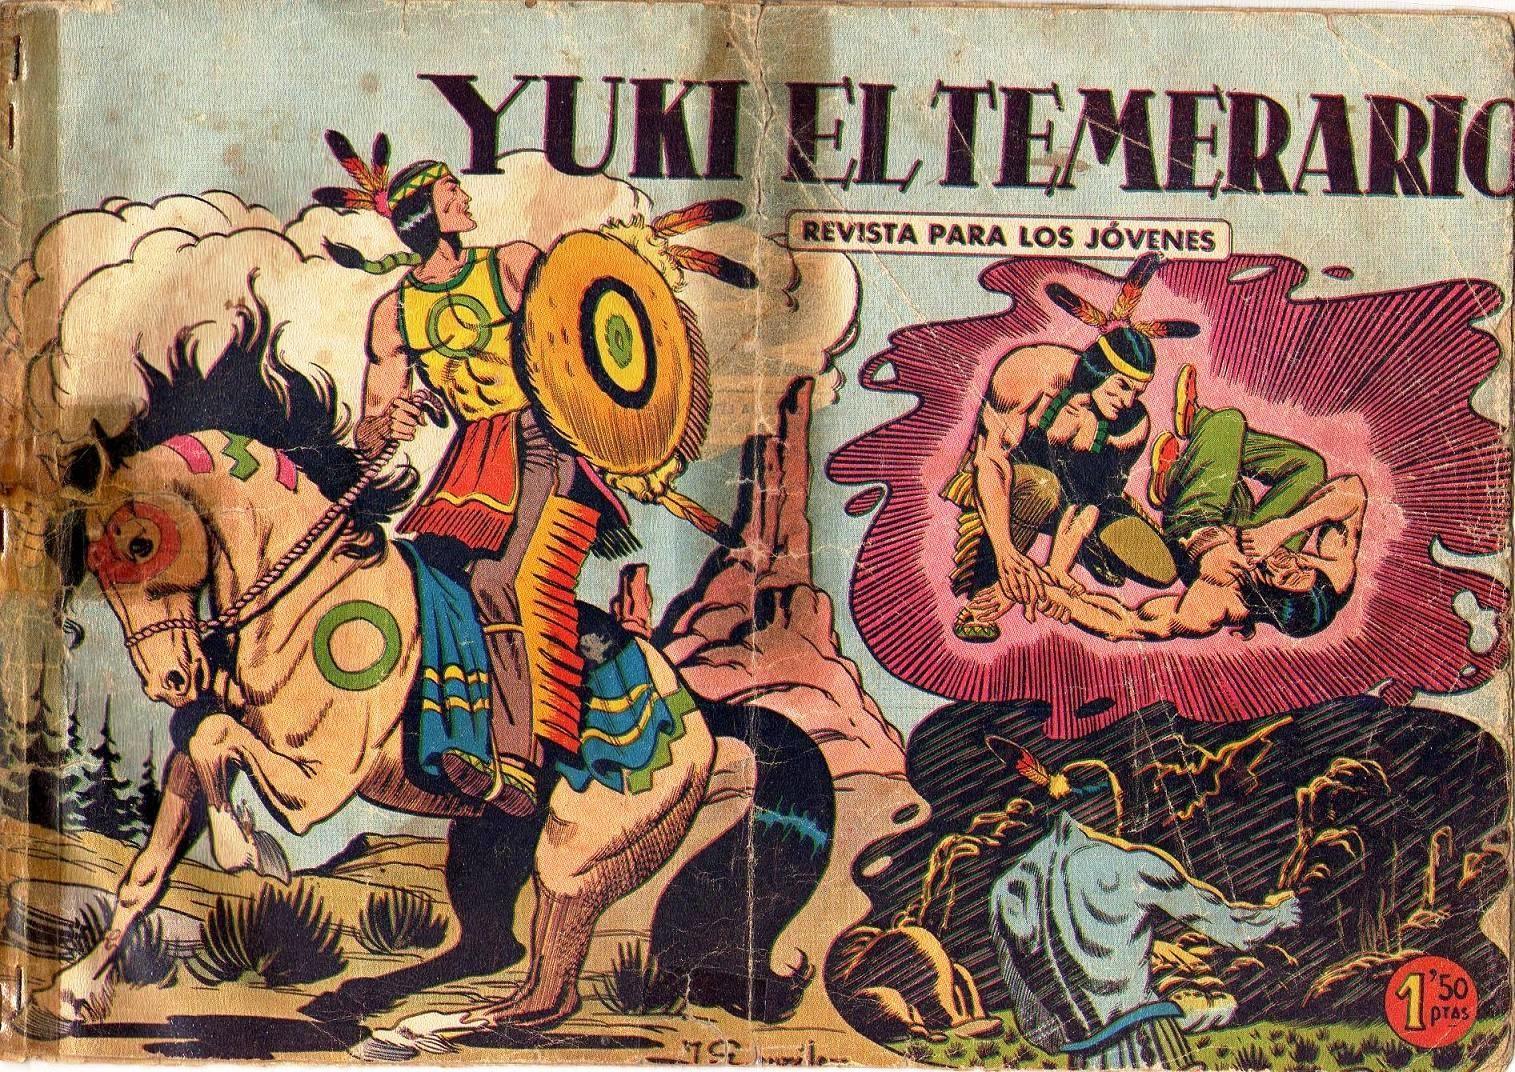 YUKI EL TEMERARIO 001